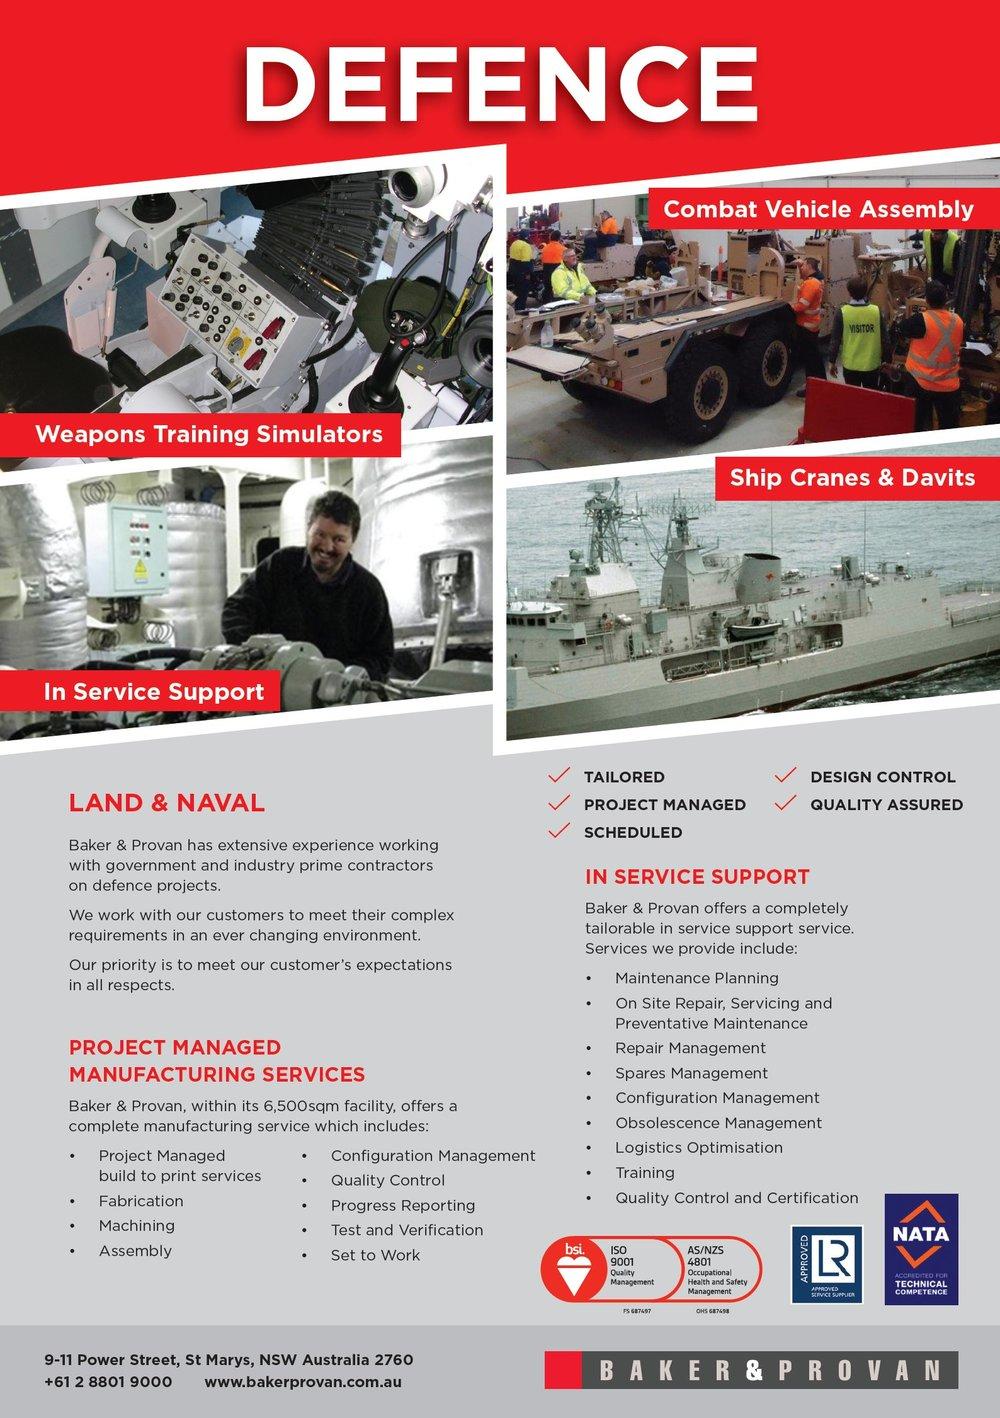 Baker & Provan Defence Brochure